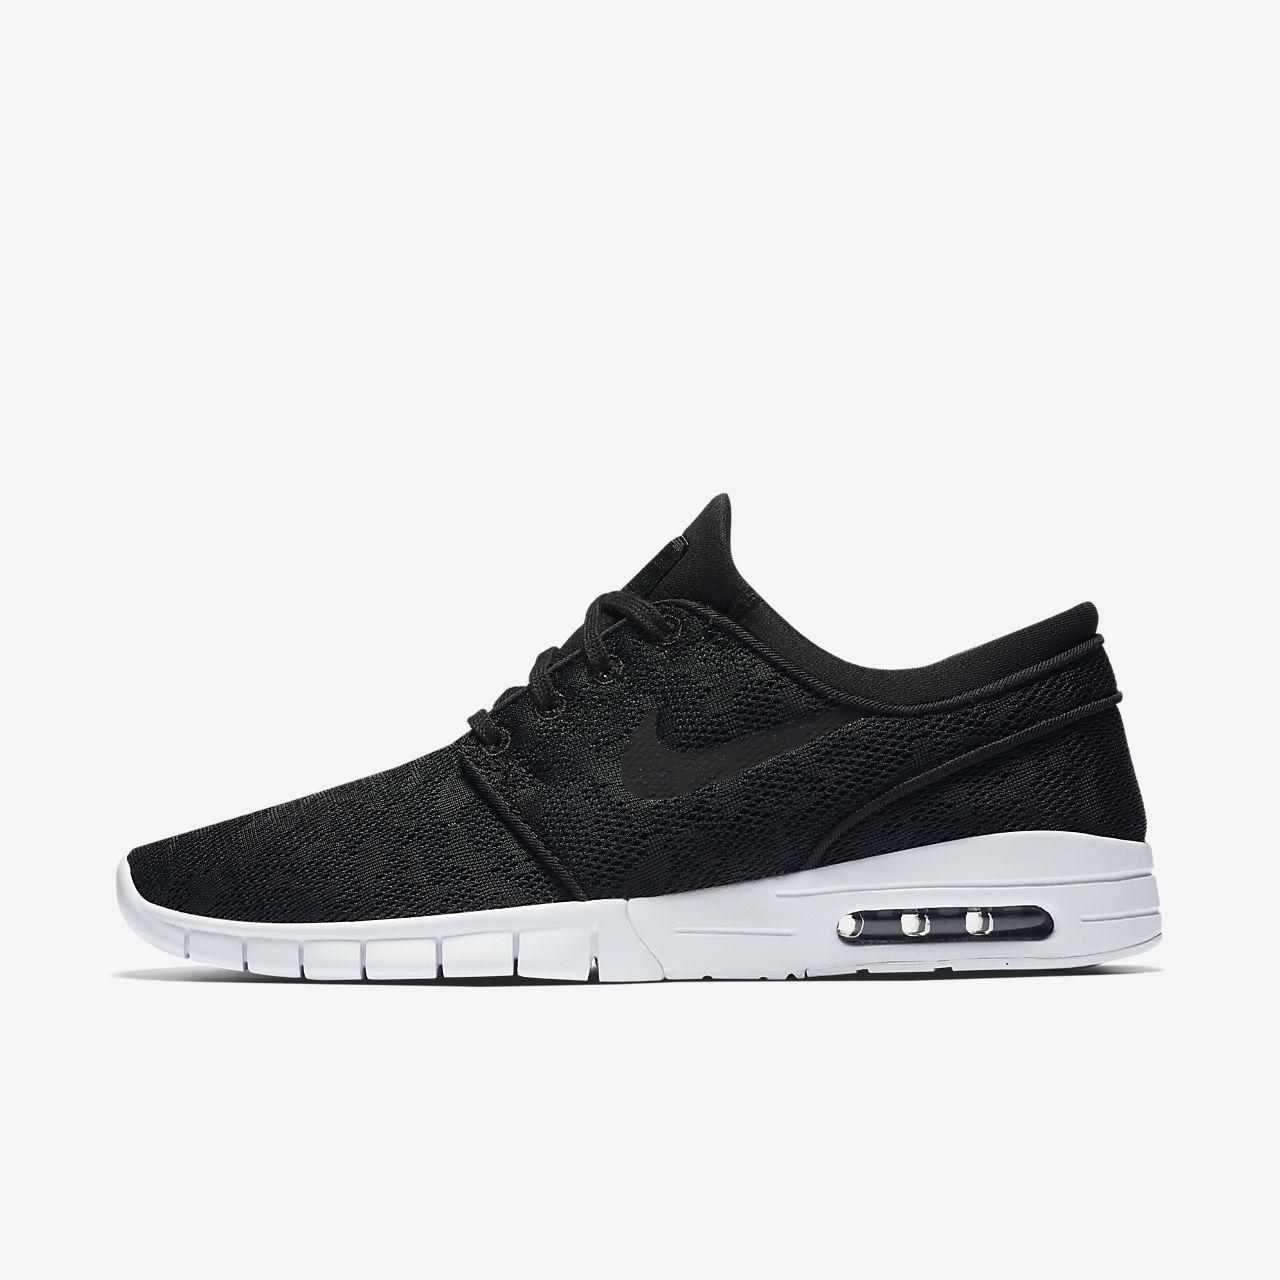 Les Nike Blazer Taille Grand Ou Petit Dejeuner